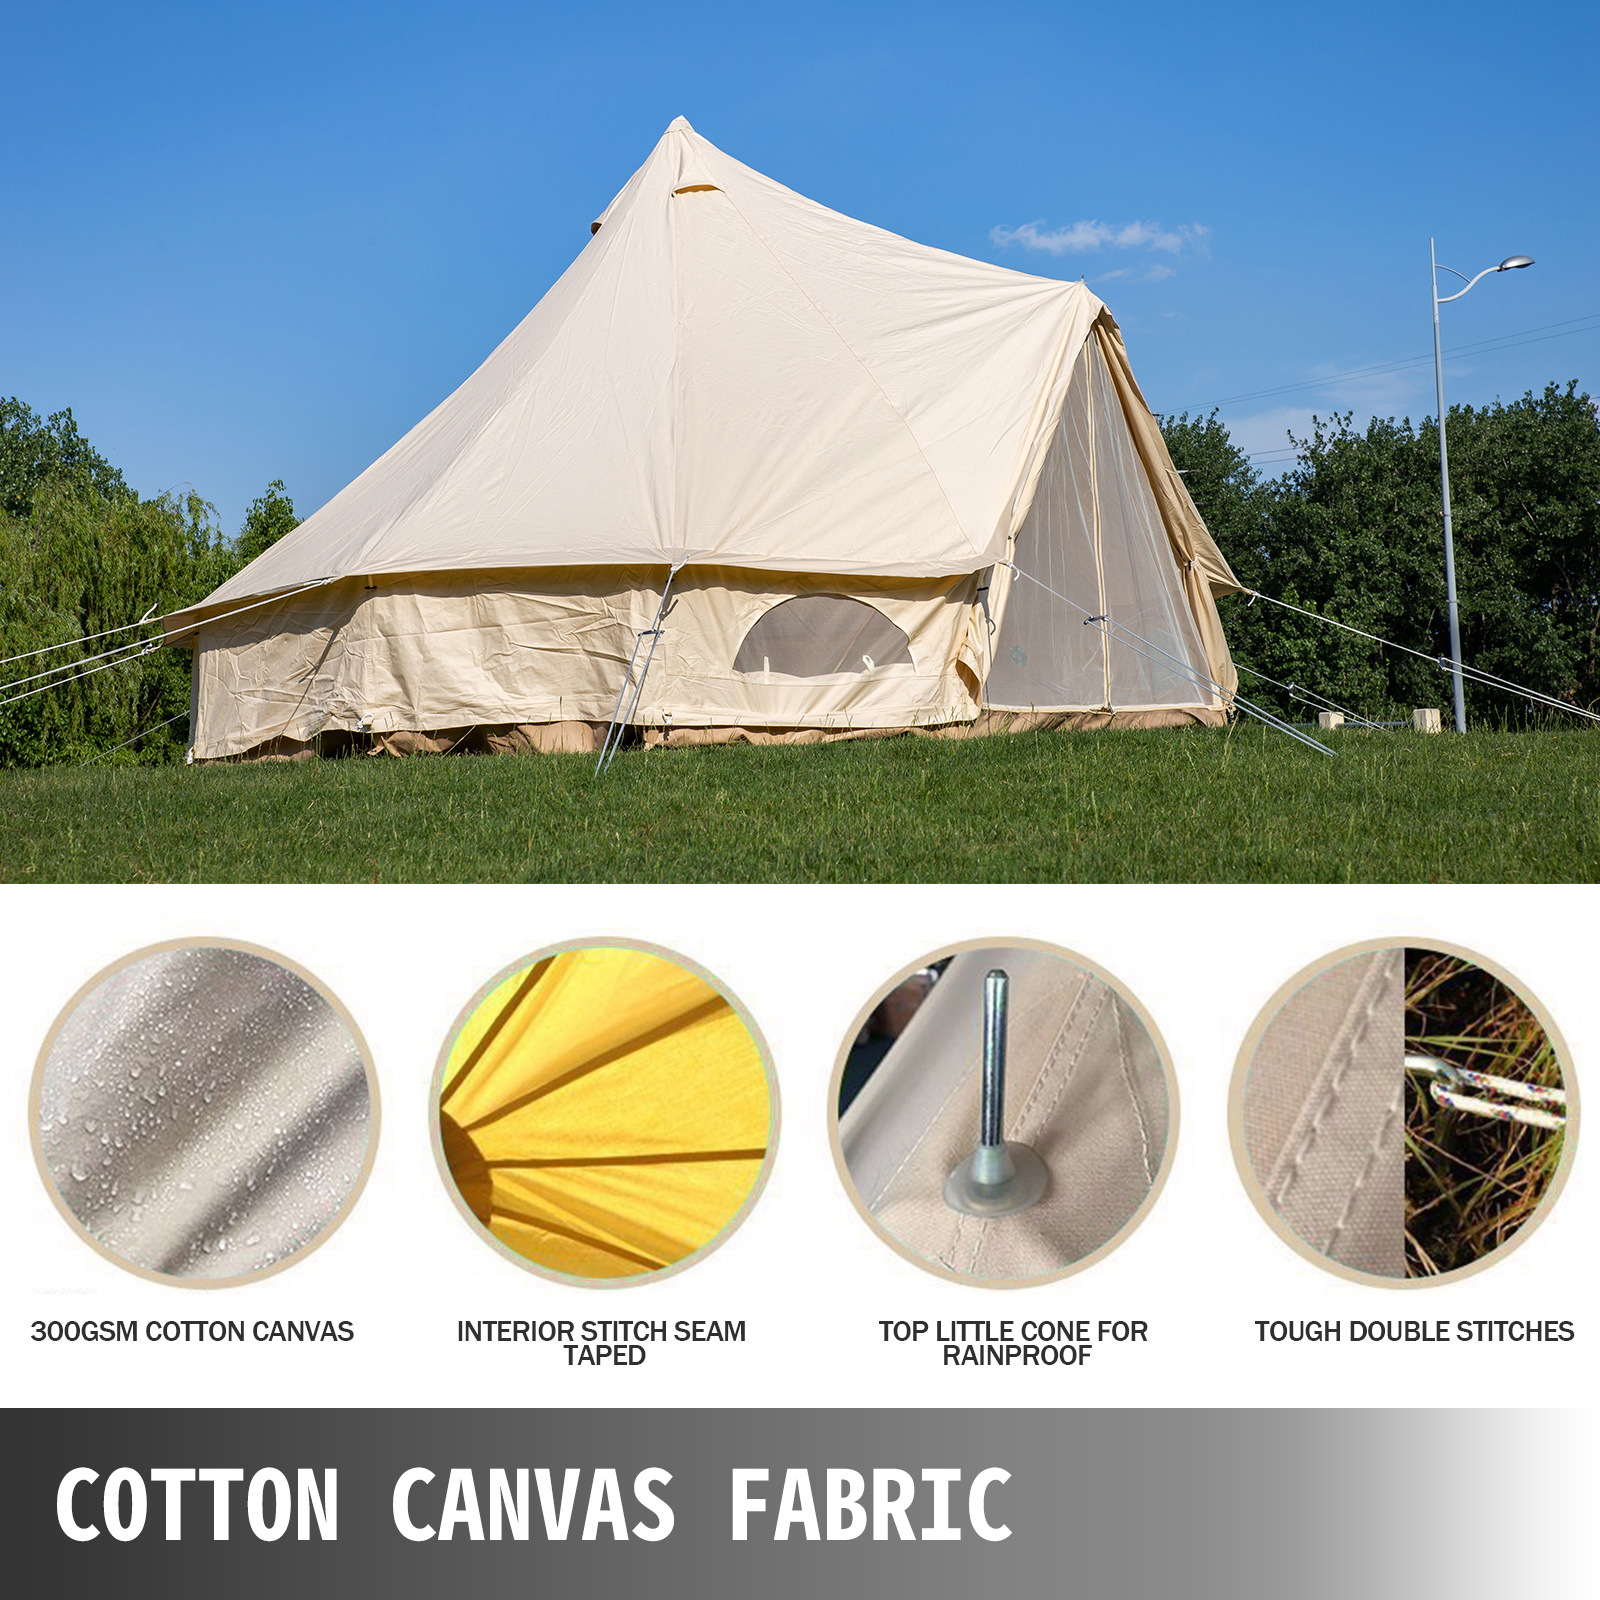 4-Season-Bell-Tent-3-4-5-6M-Waterproof-Cotton-Canvas-Glamping-Camping-Beach-US thumbnail 50